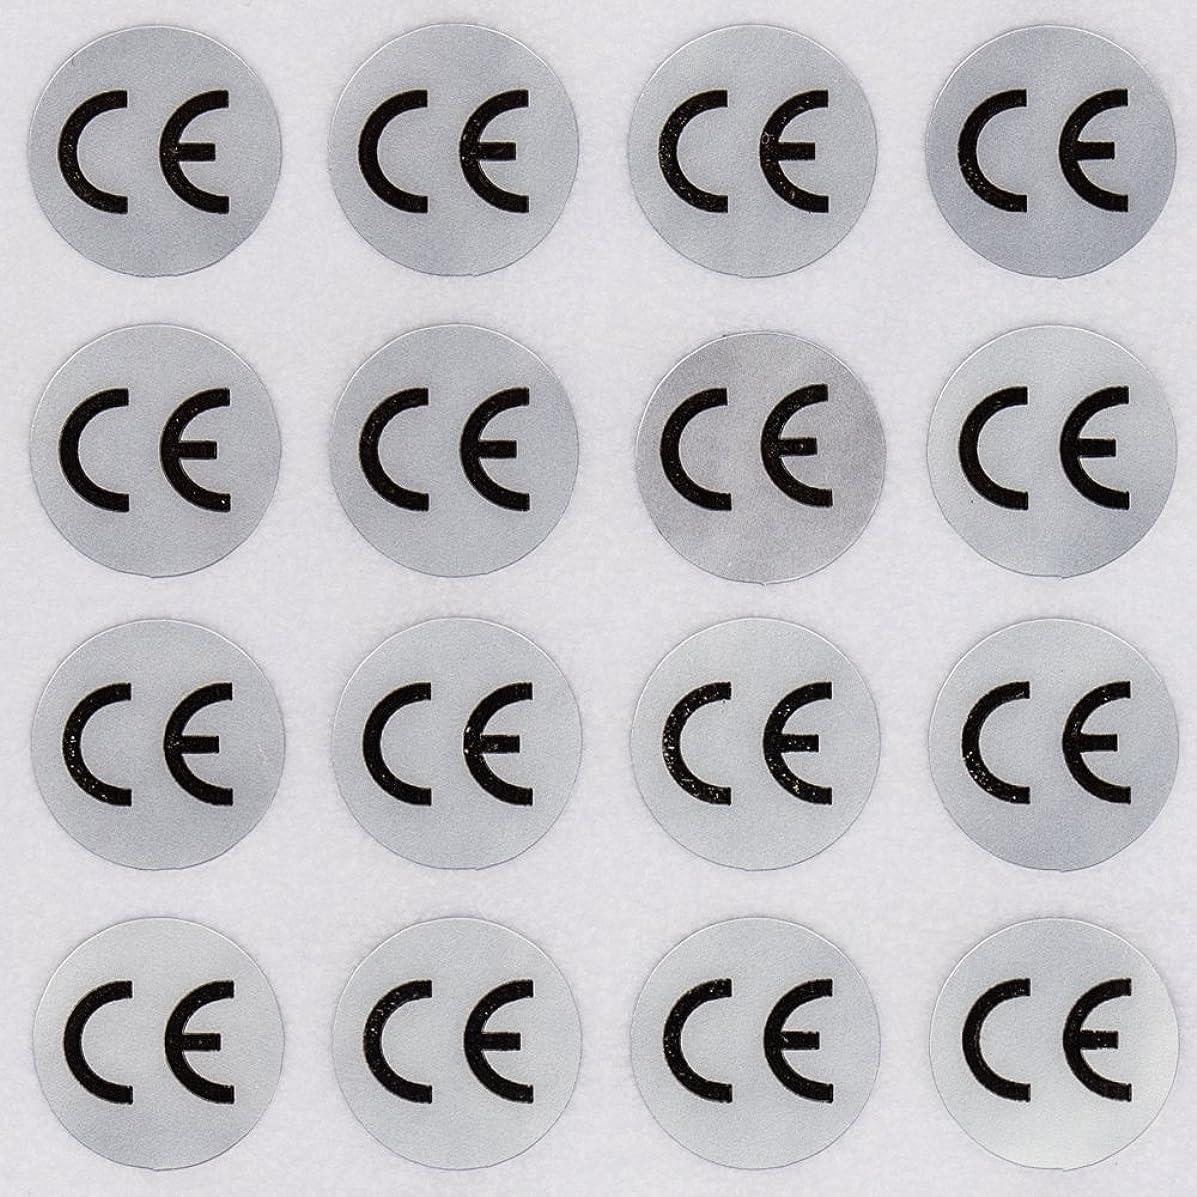 1000pcs CE sticker CE marks CE adhesive sticker round shape diameter 1CM